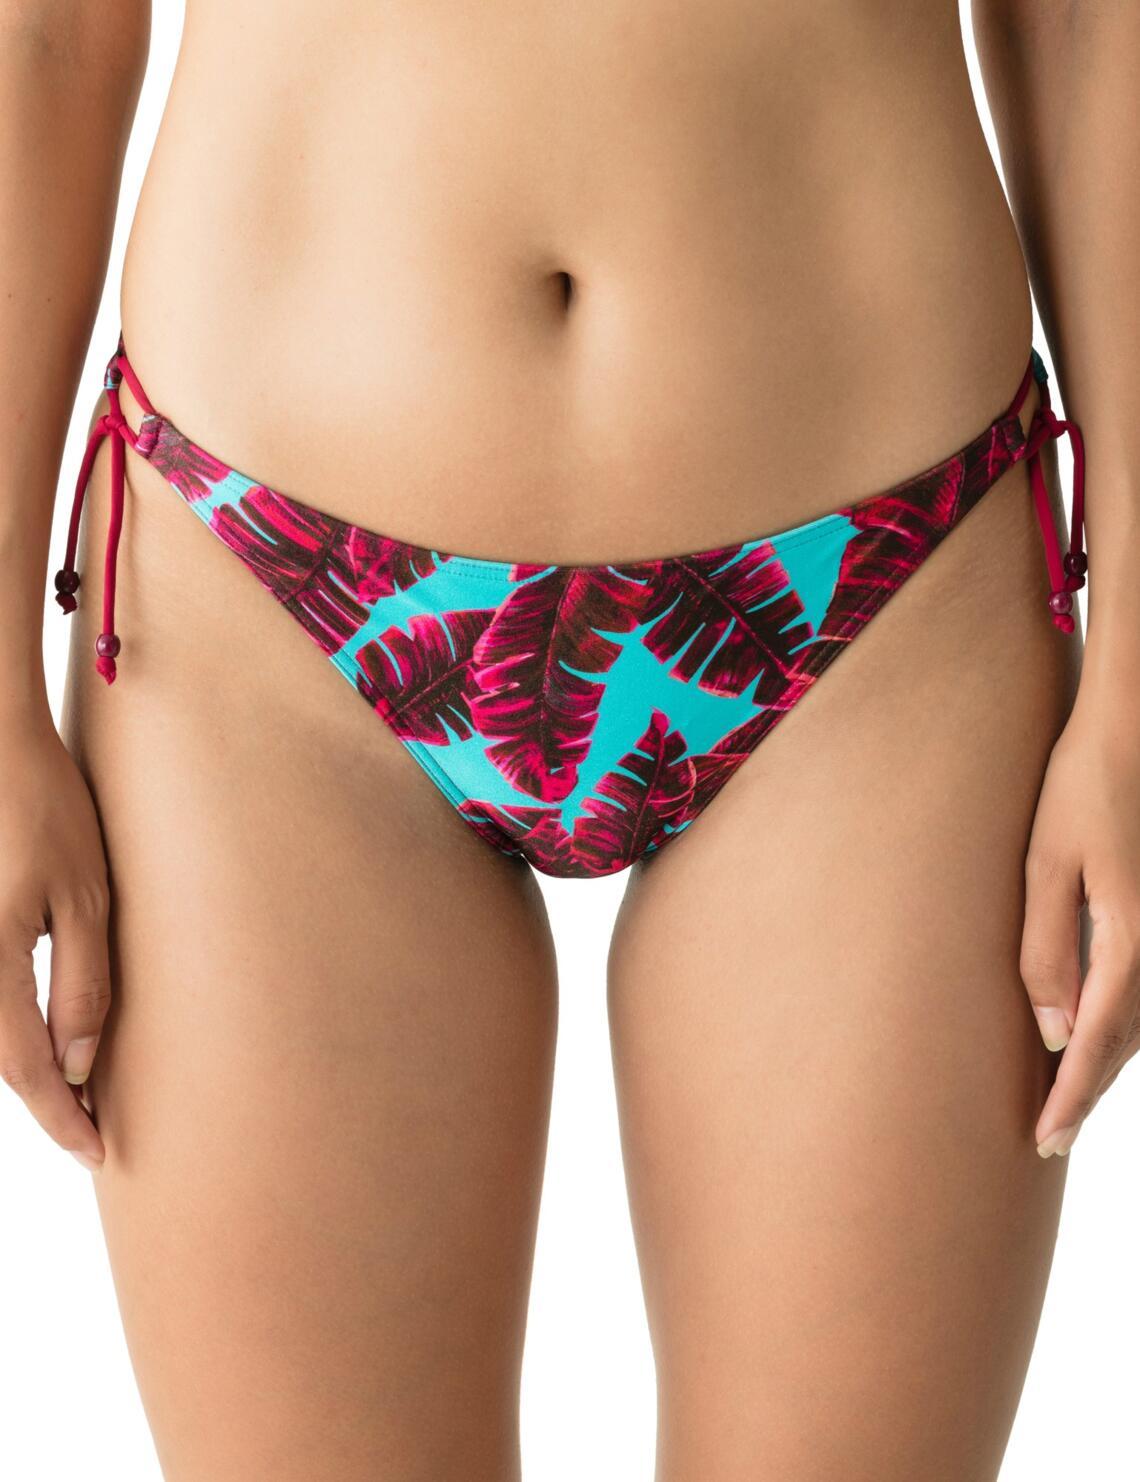 4005753 Prima Donna Swim Palm Springs Waist Rope Tie Side Bikini Brief - 4005753 Pink Flavor